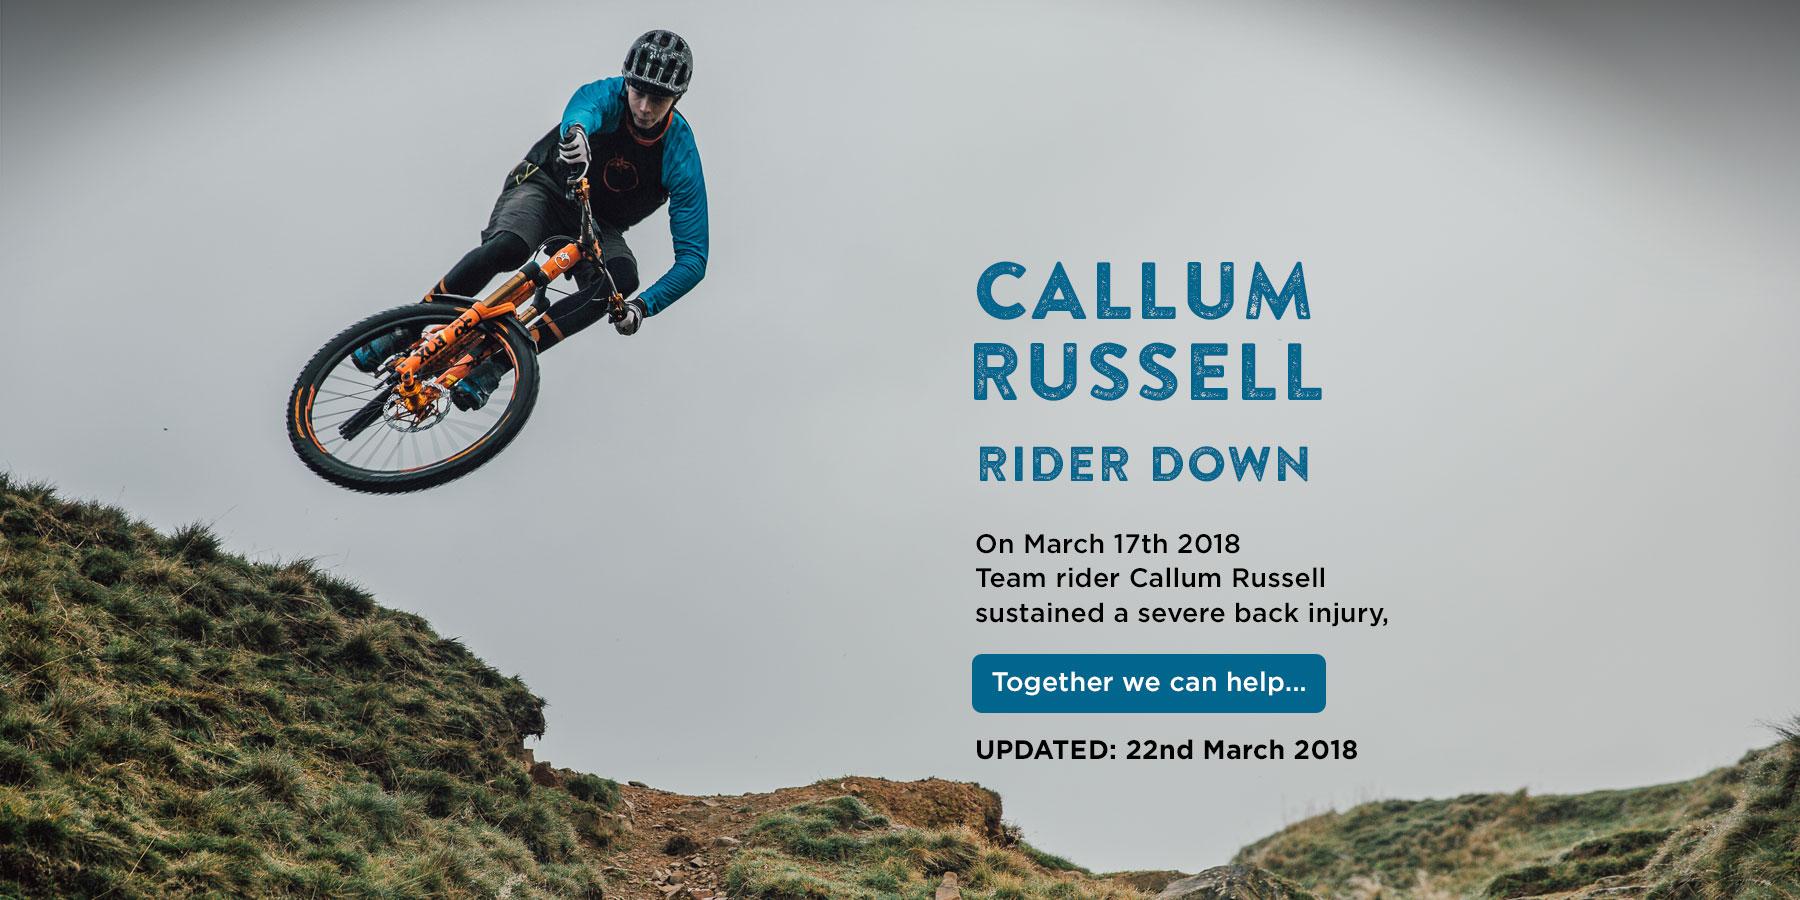 Callum Russell Rider Down